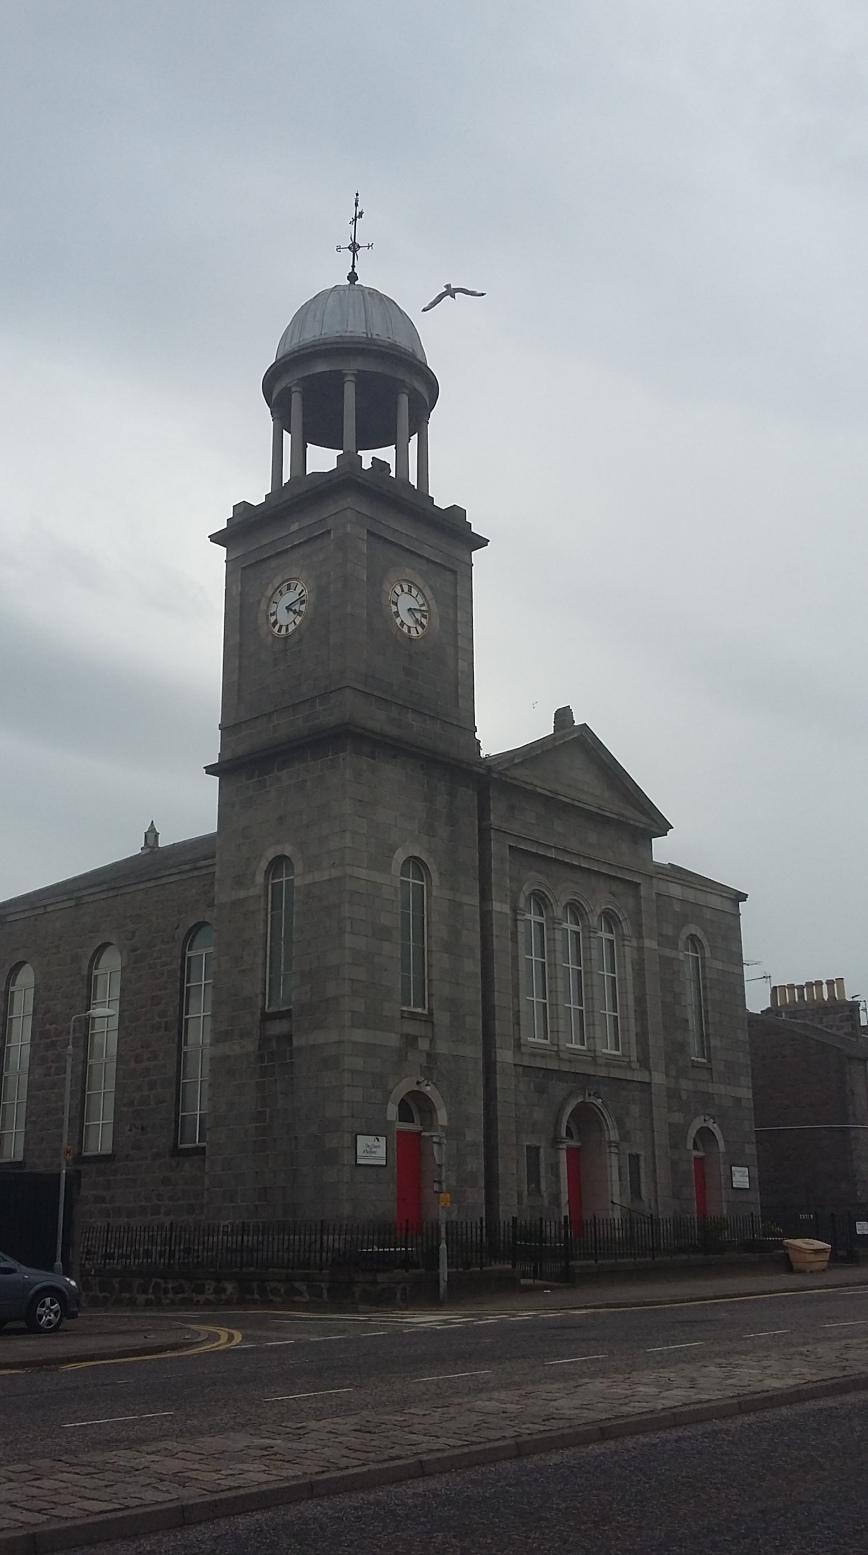 St Stephens Parish Church, Aberdeen - Emma's Picture Postcards